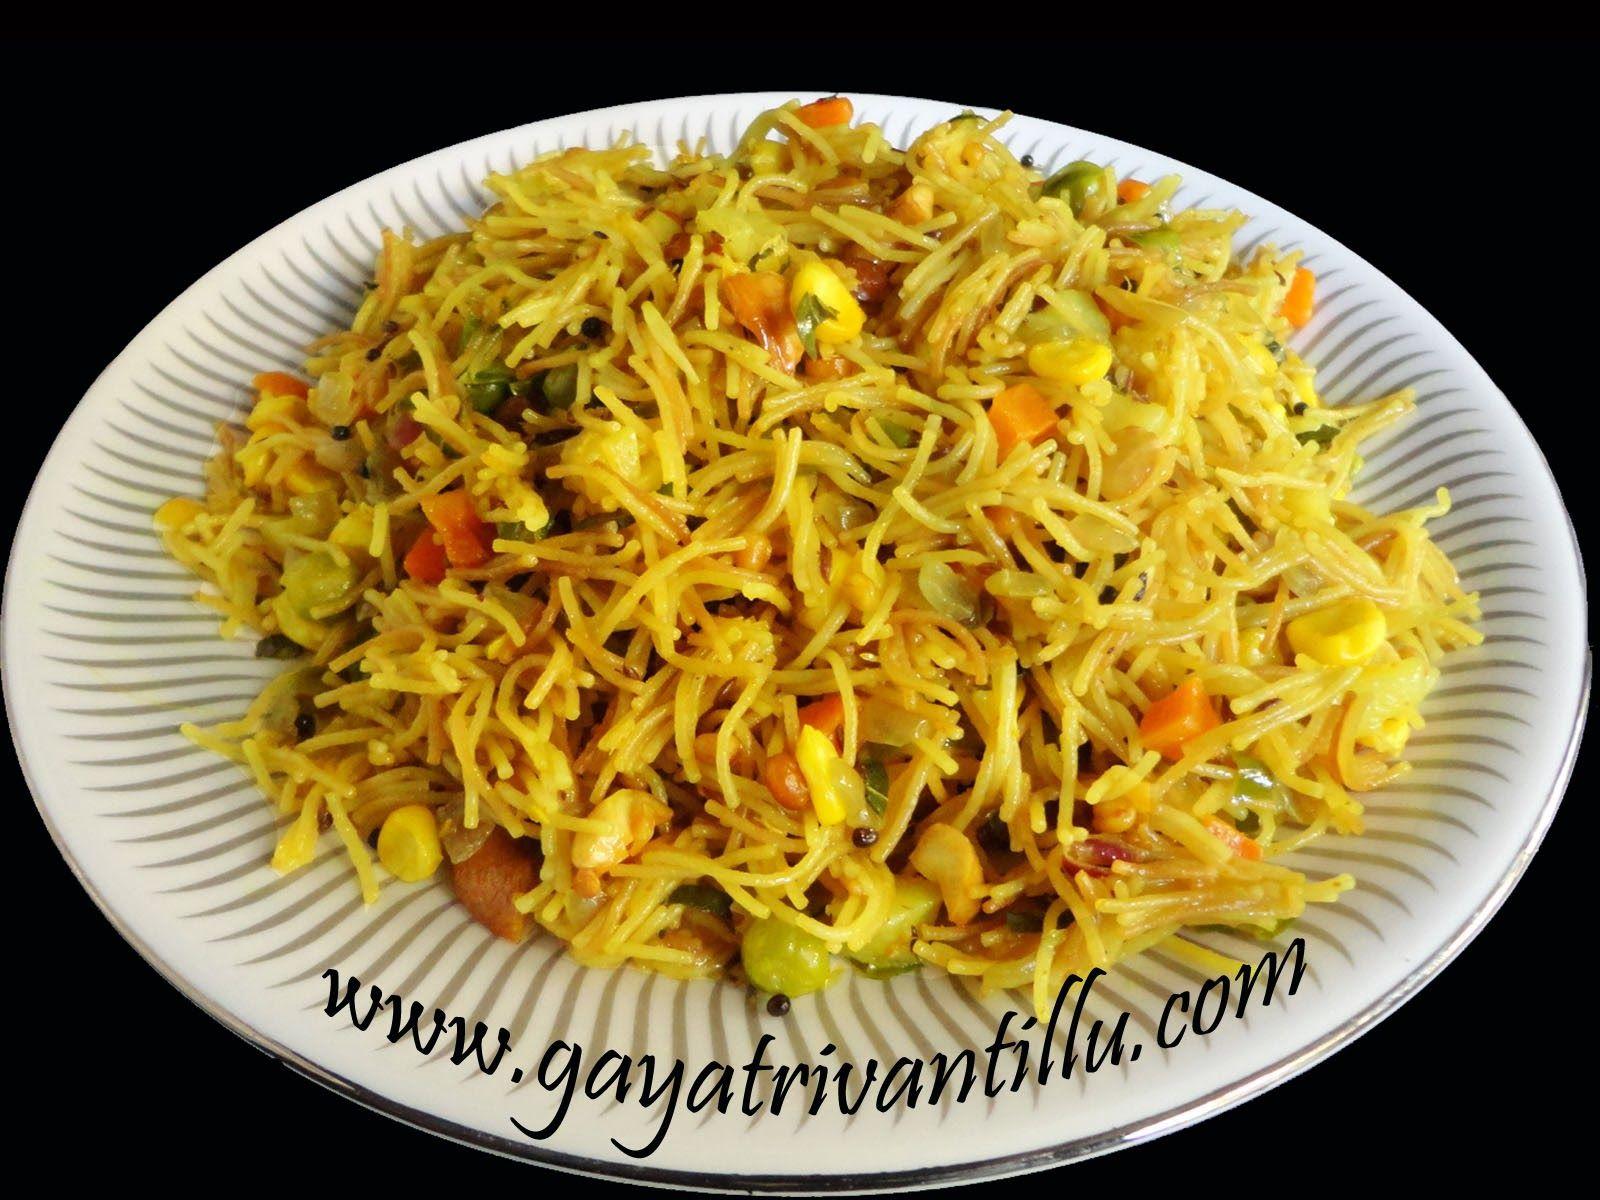 Vegetable semia upma vegetable semia upma andhra recipes telugu vantalu indian vegetarian cooking gayatri forumfinder Gallery